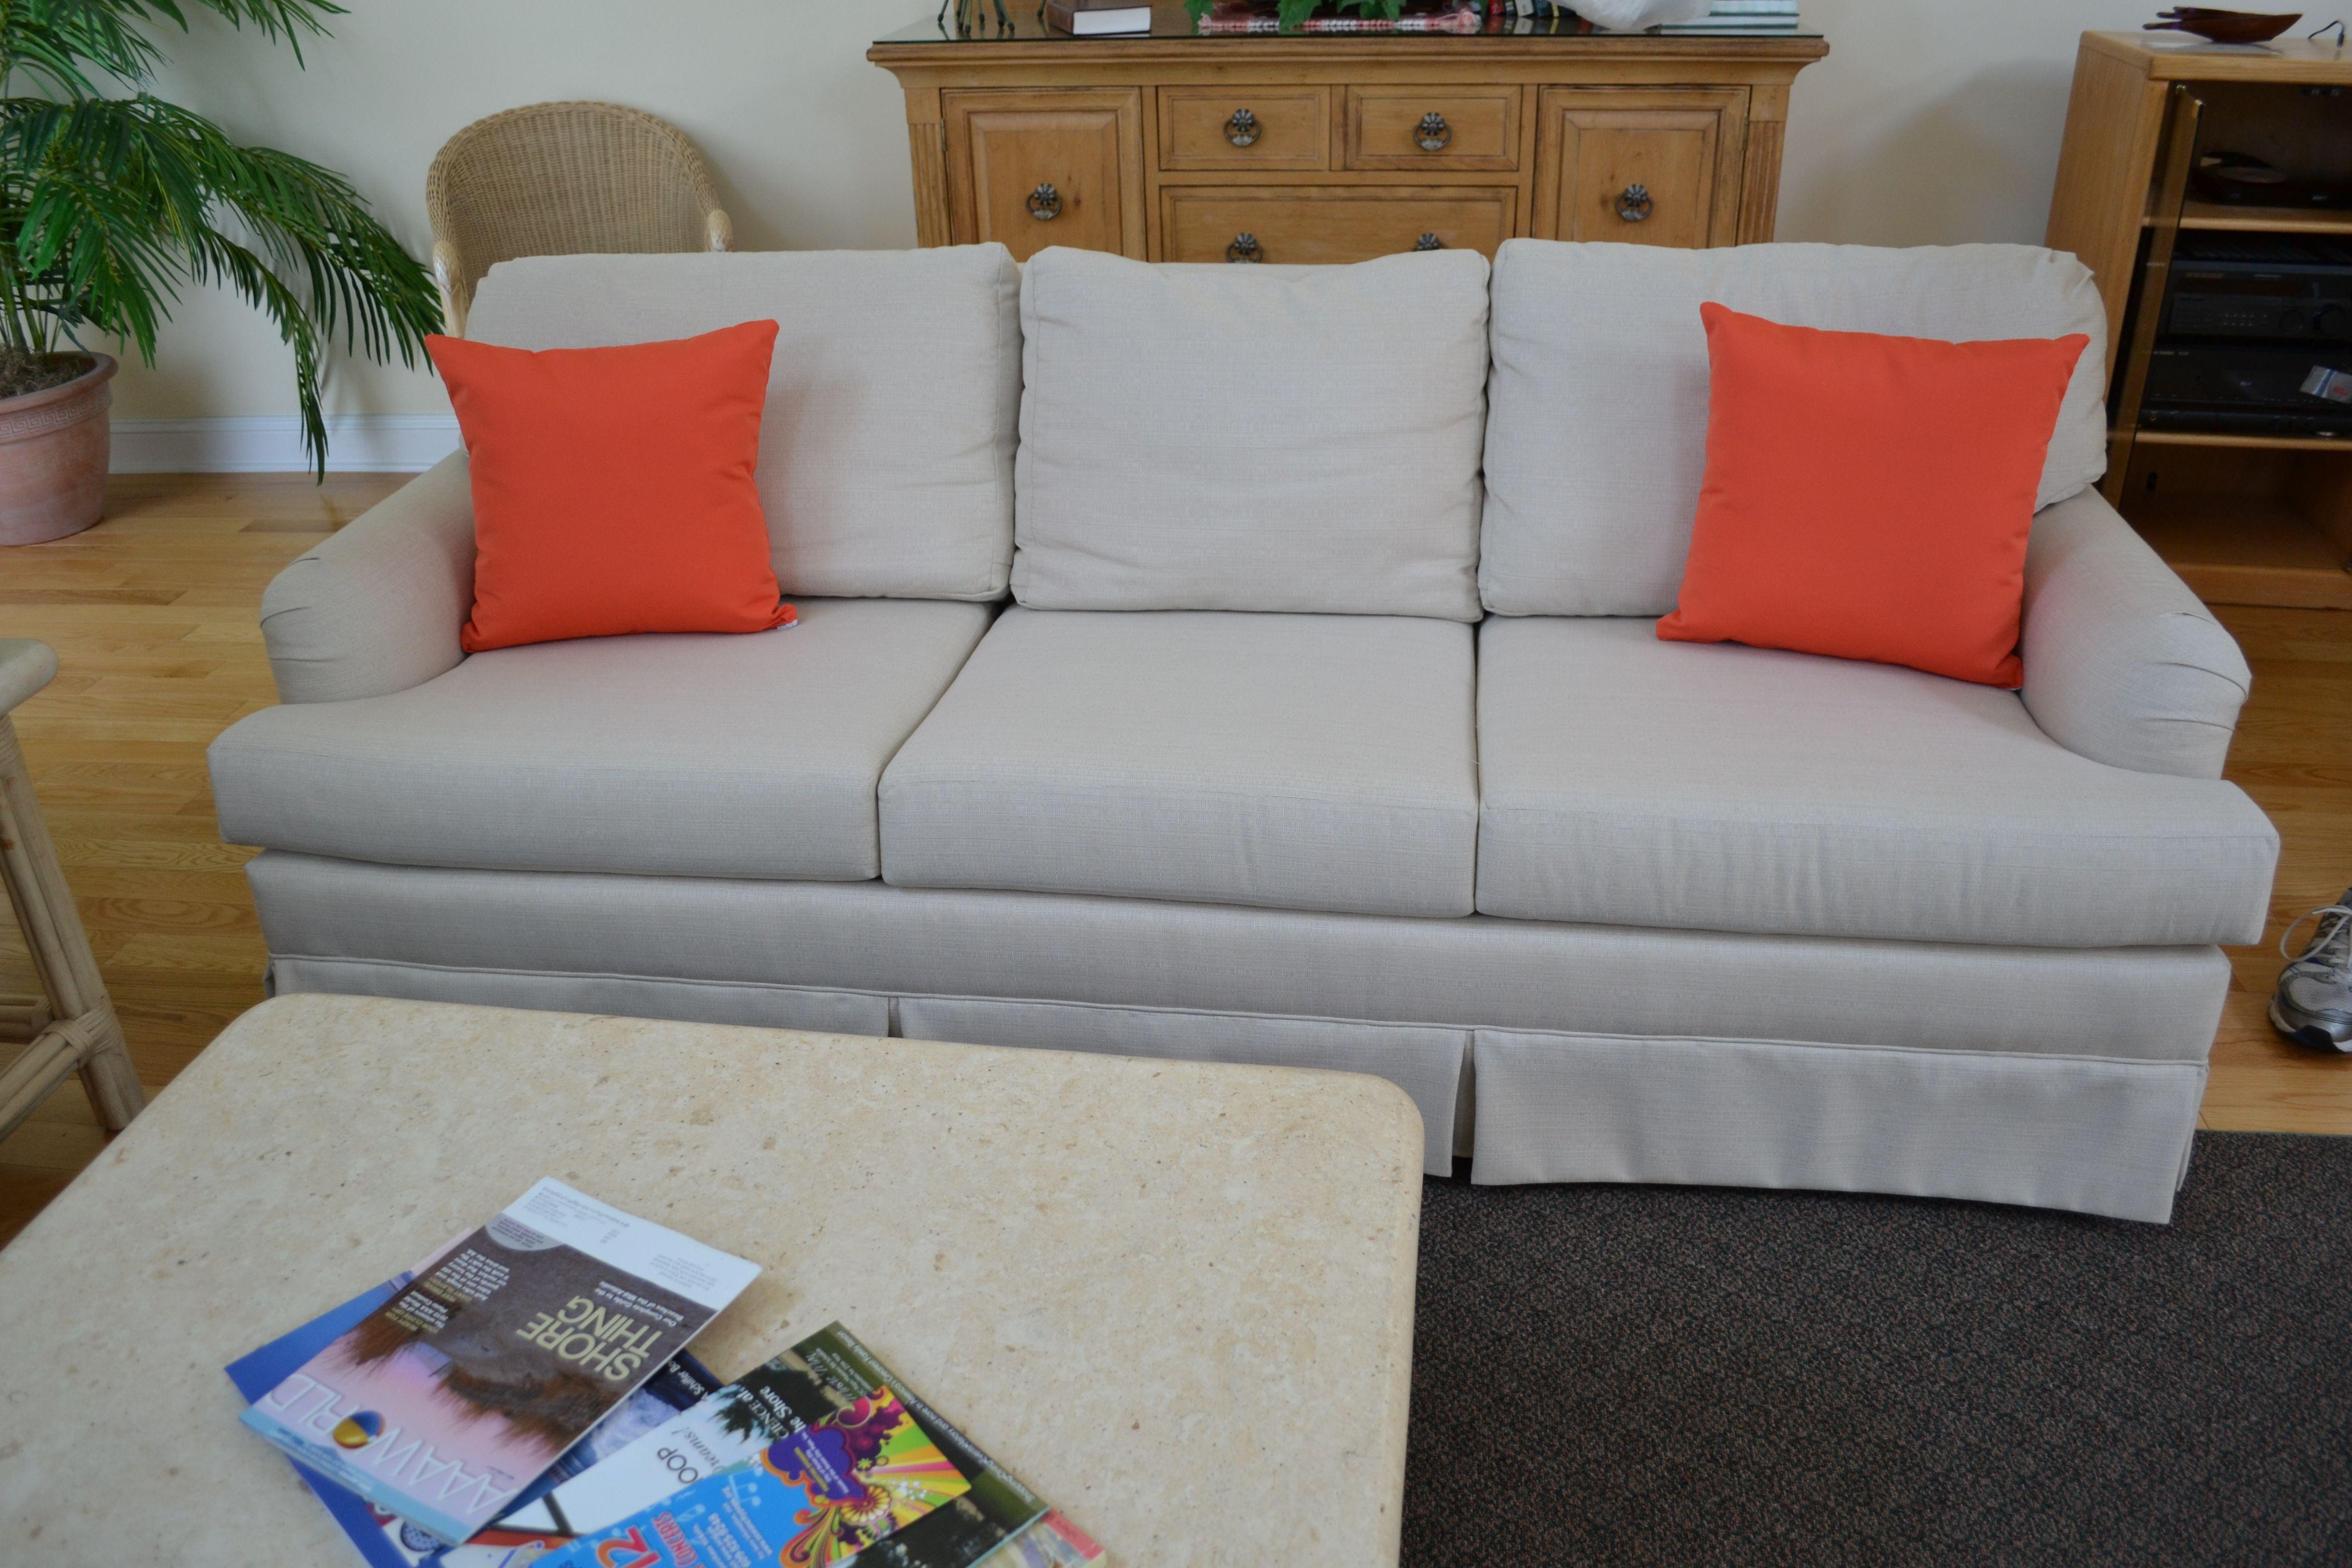 This three cushion sofa was reupholstered in Sunbrella Linen